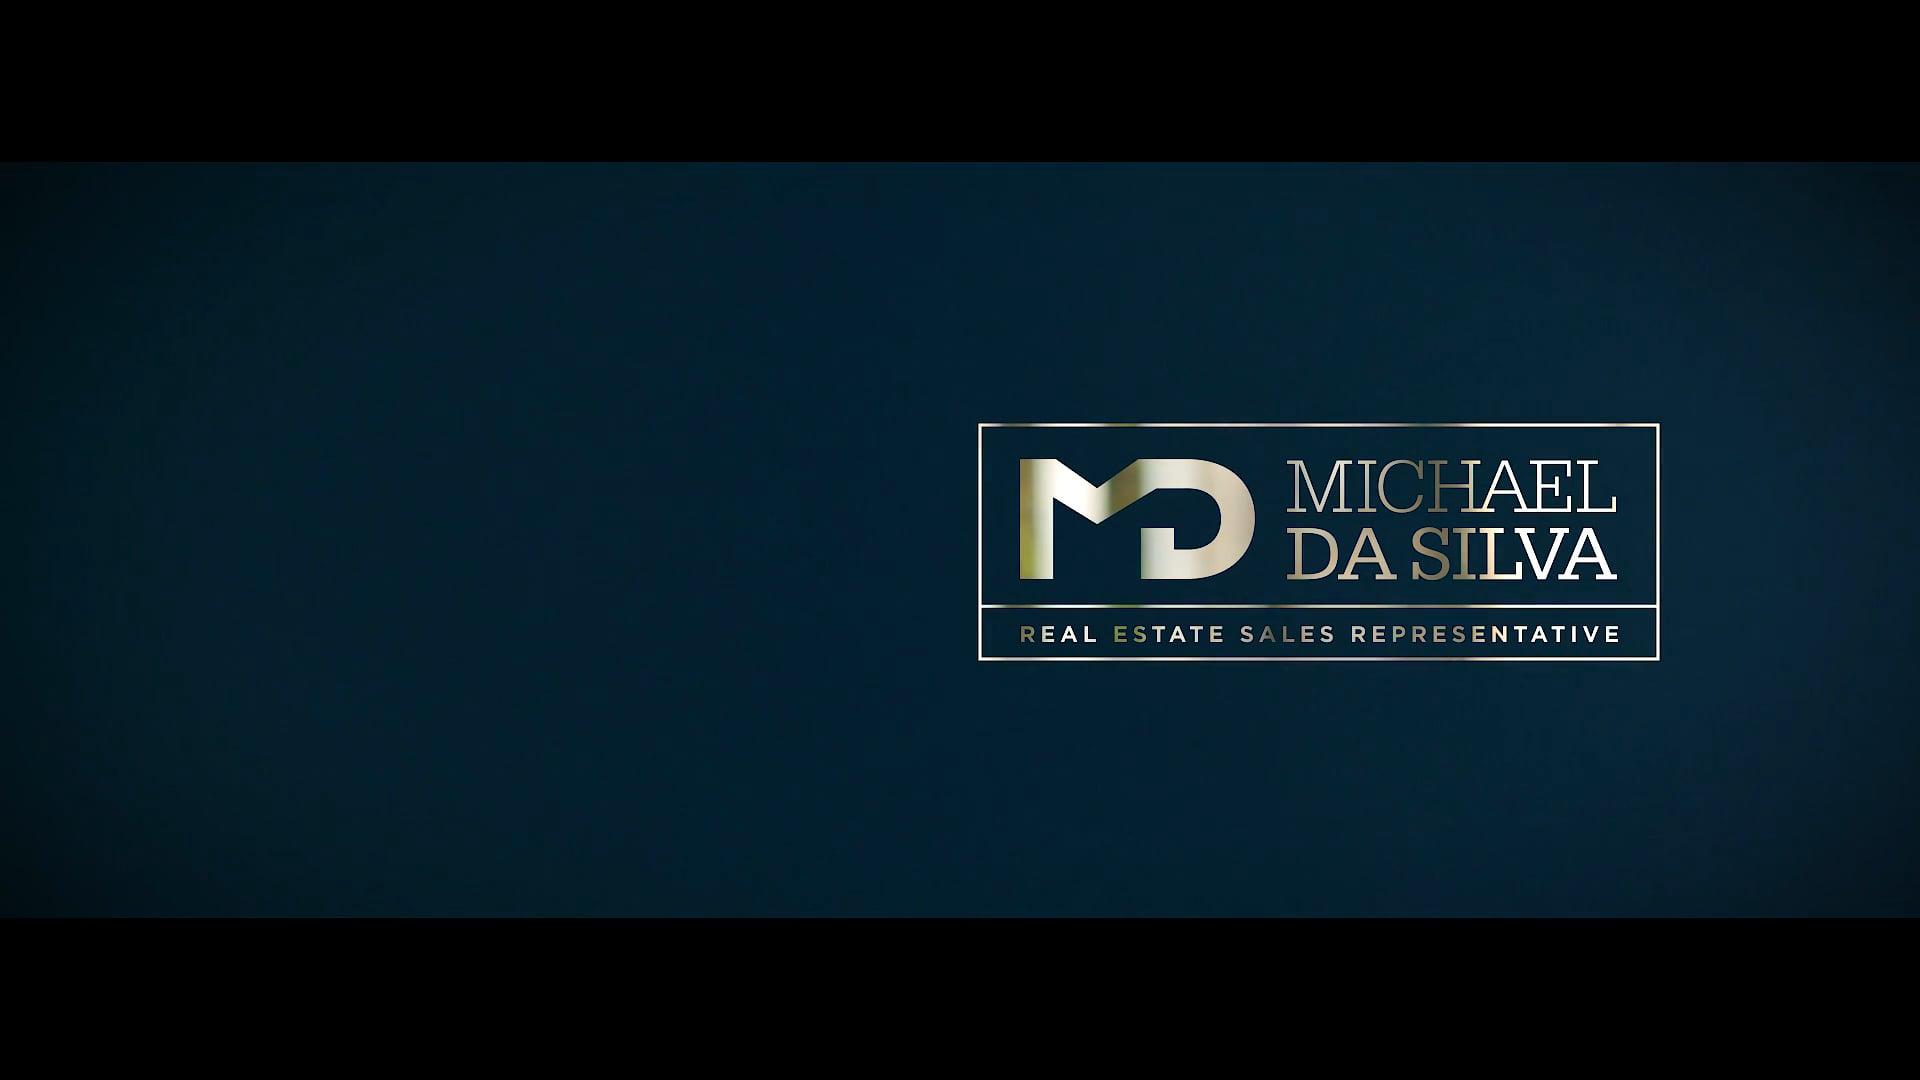 Mike Da Silva -Real Estate Agent-My story